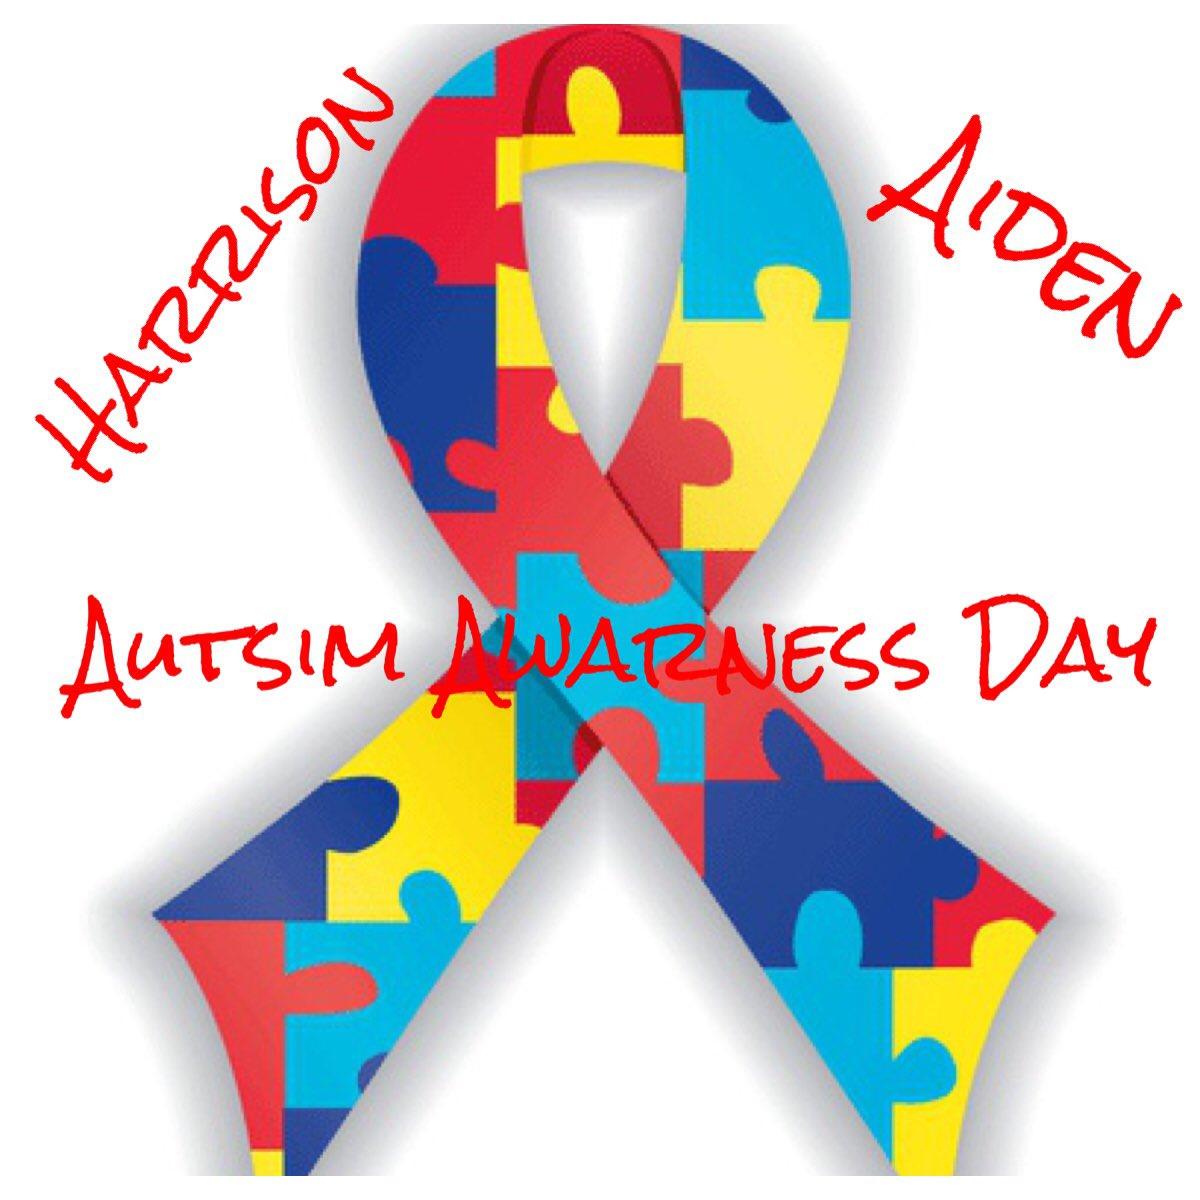 RT @foggy_spectrum: @rickygervais @lemontwittor @GaryBarlow @GaryLineker @takethat @KeithDuffyExp #autism please retweet. https://t.co/s3hp…